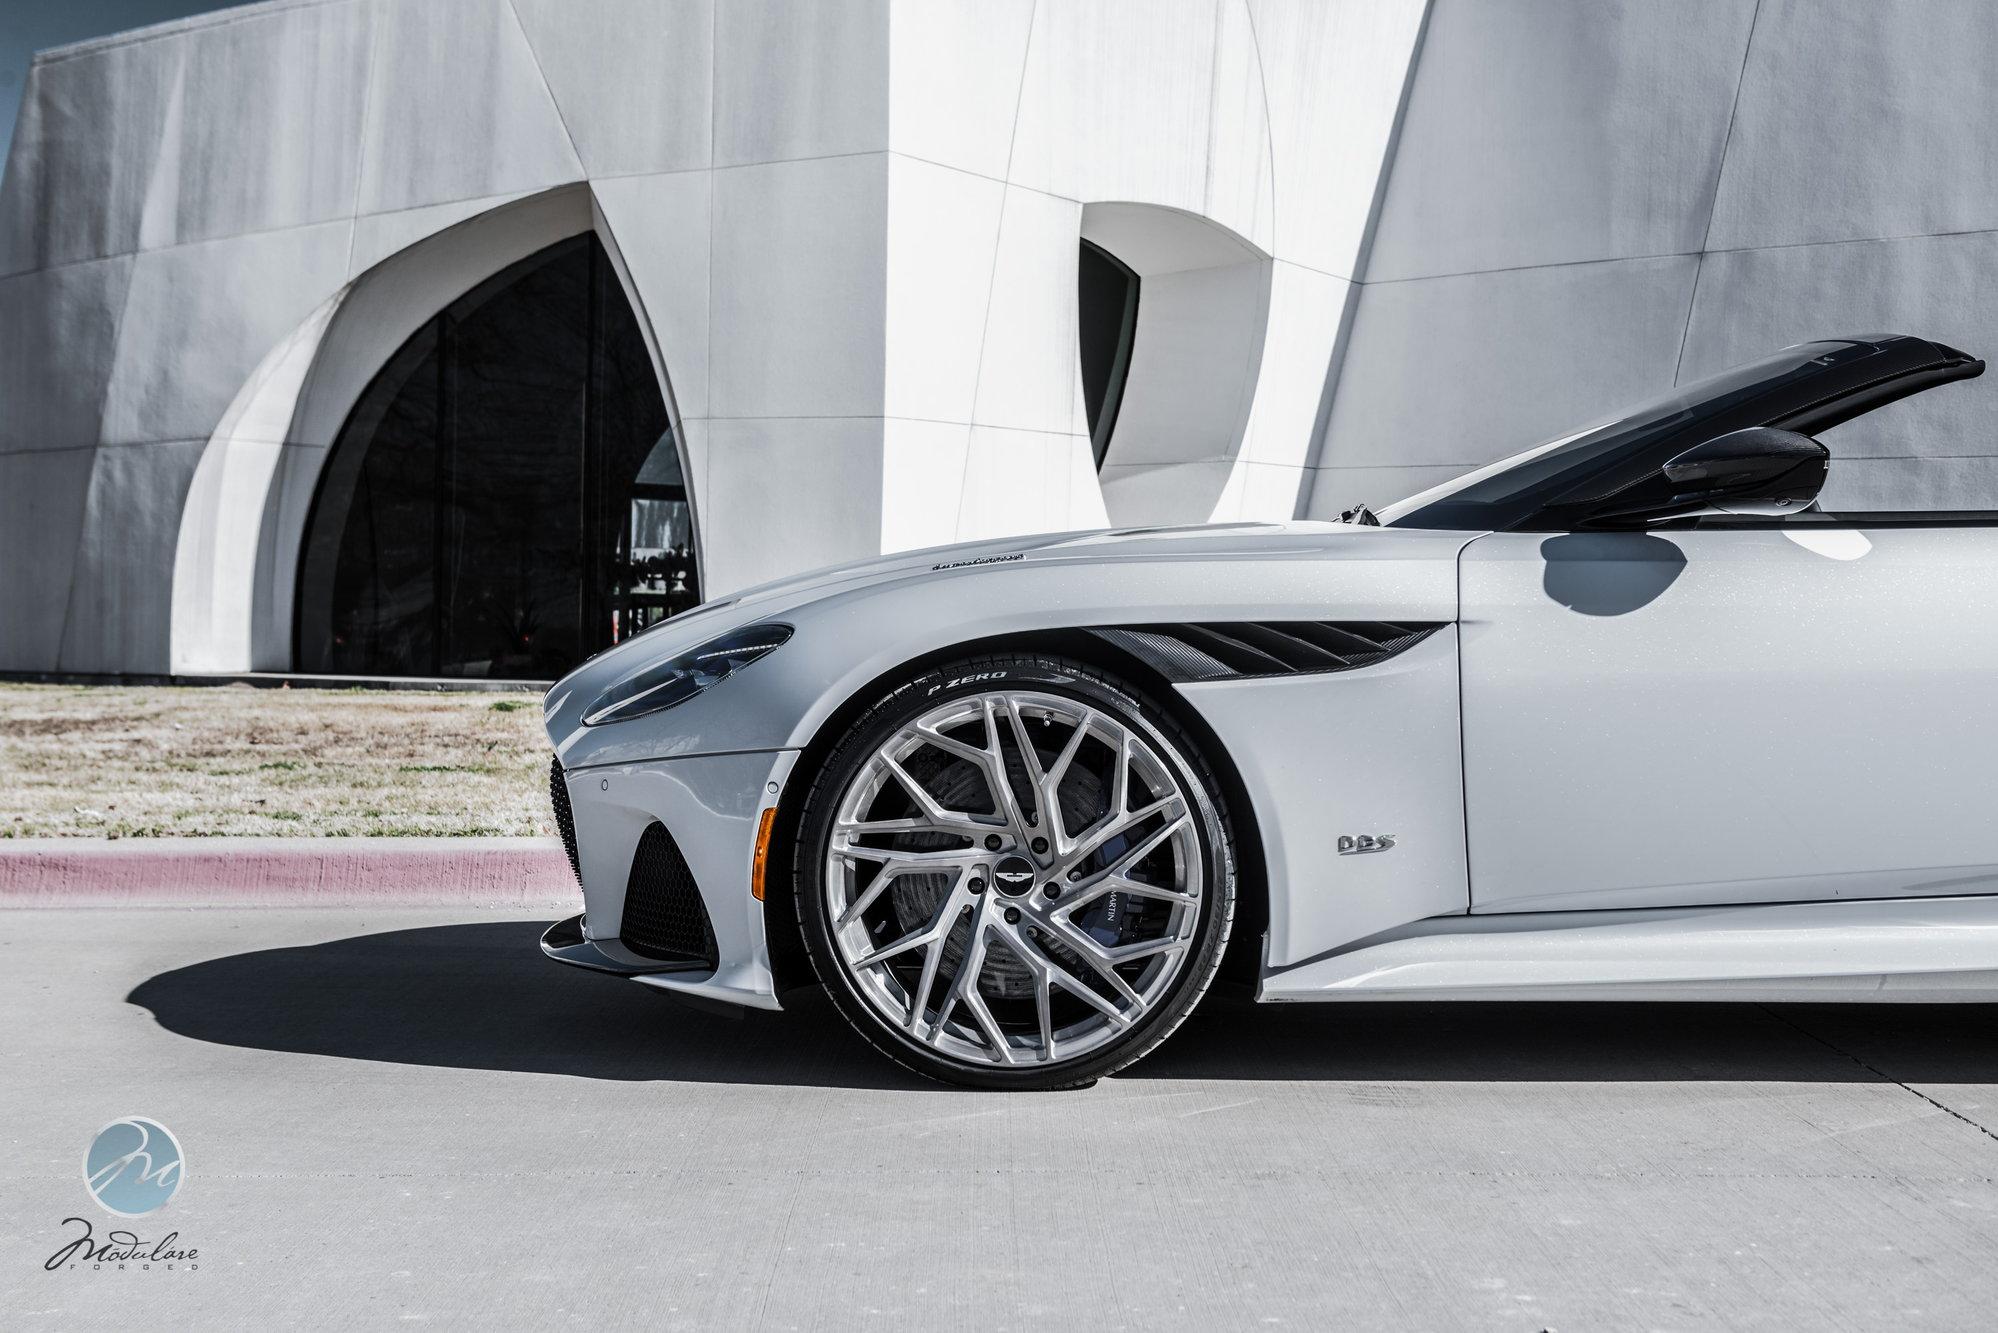 Modulare Wheels X Aston Martin Dallas 2019 Dbs Superleggera Volante 22 Modulare Teamspeed Com